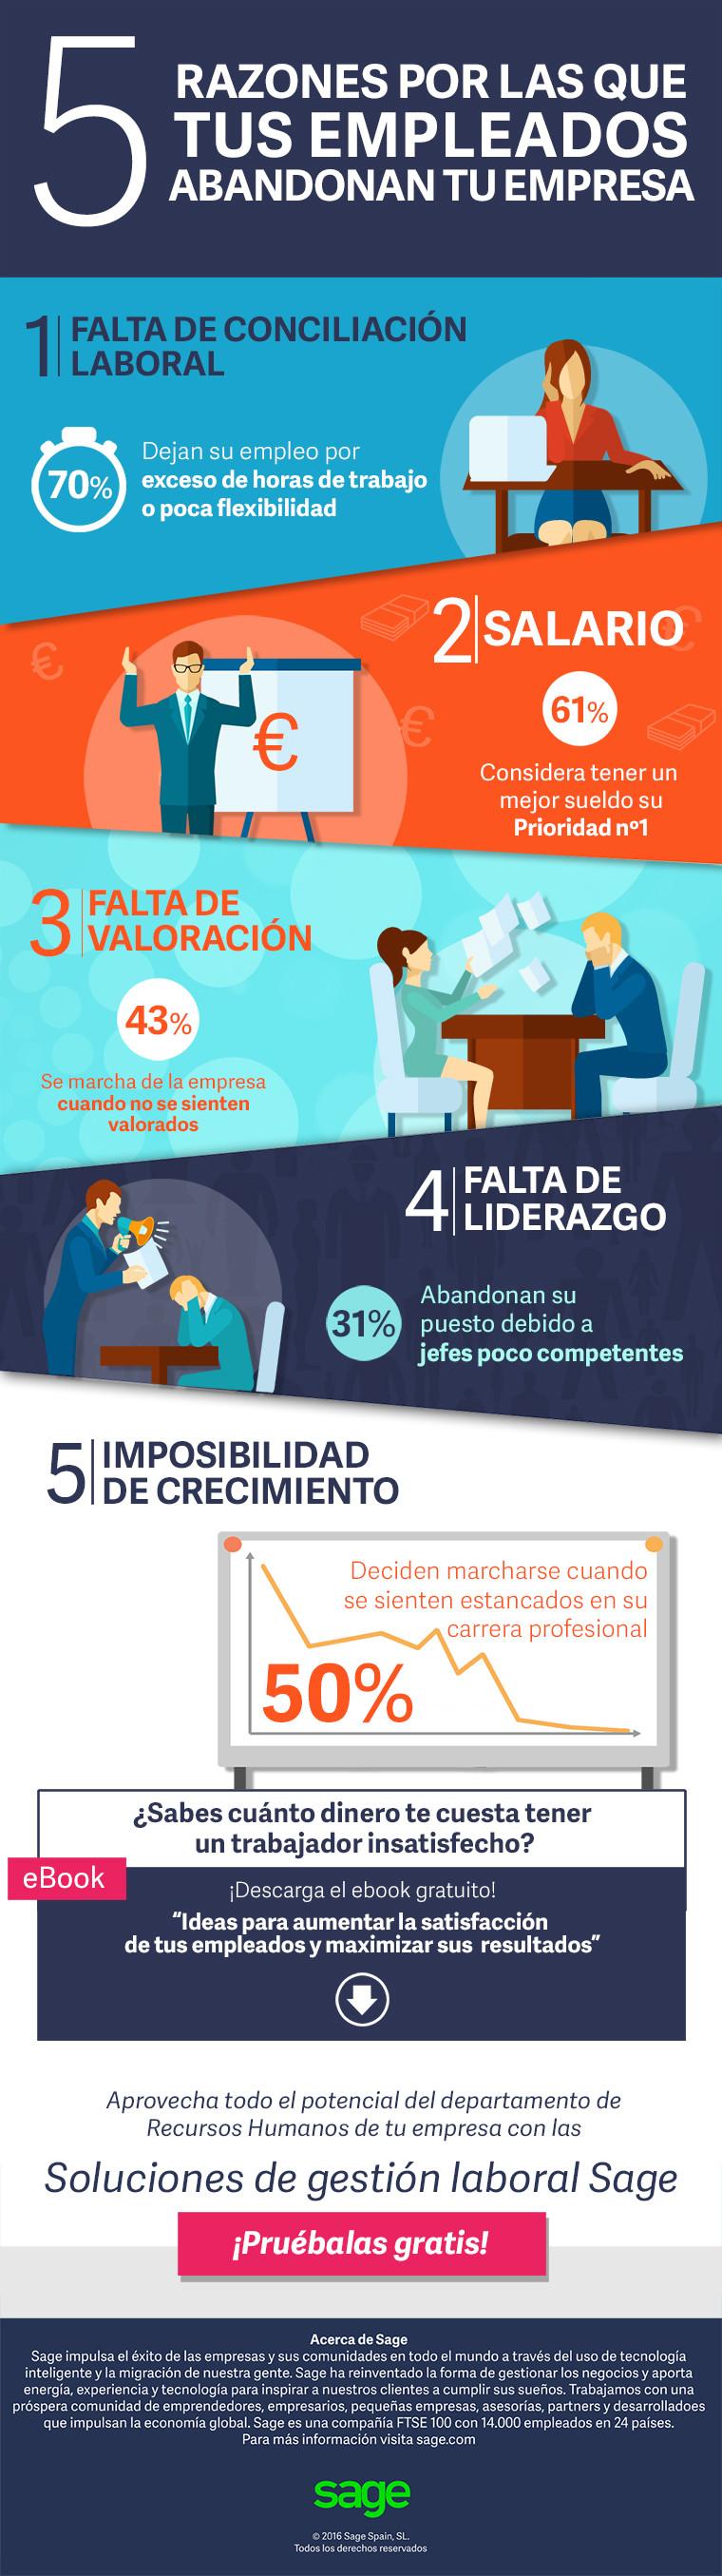 17.02.2016 - Infografia_5 razones empleados abandonan empresa_ 1200px (1)